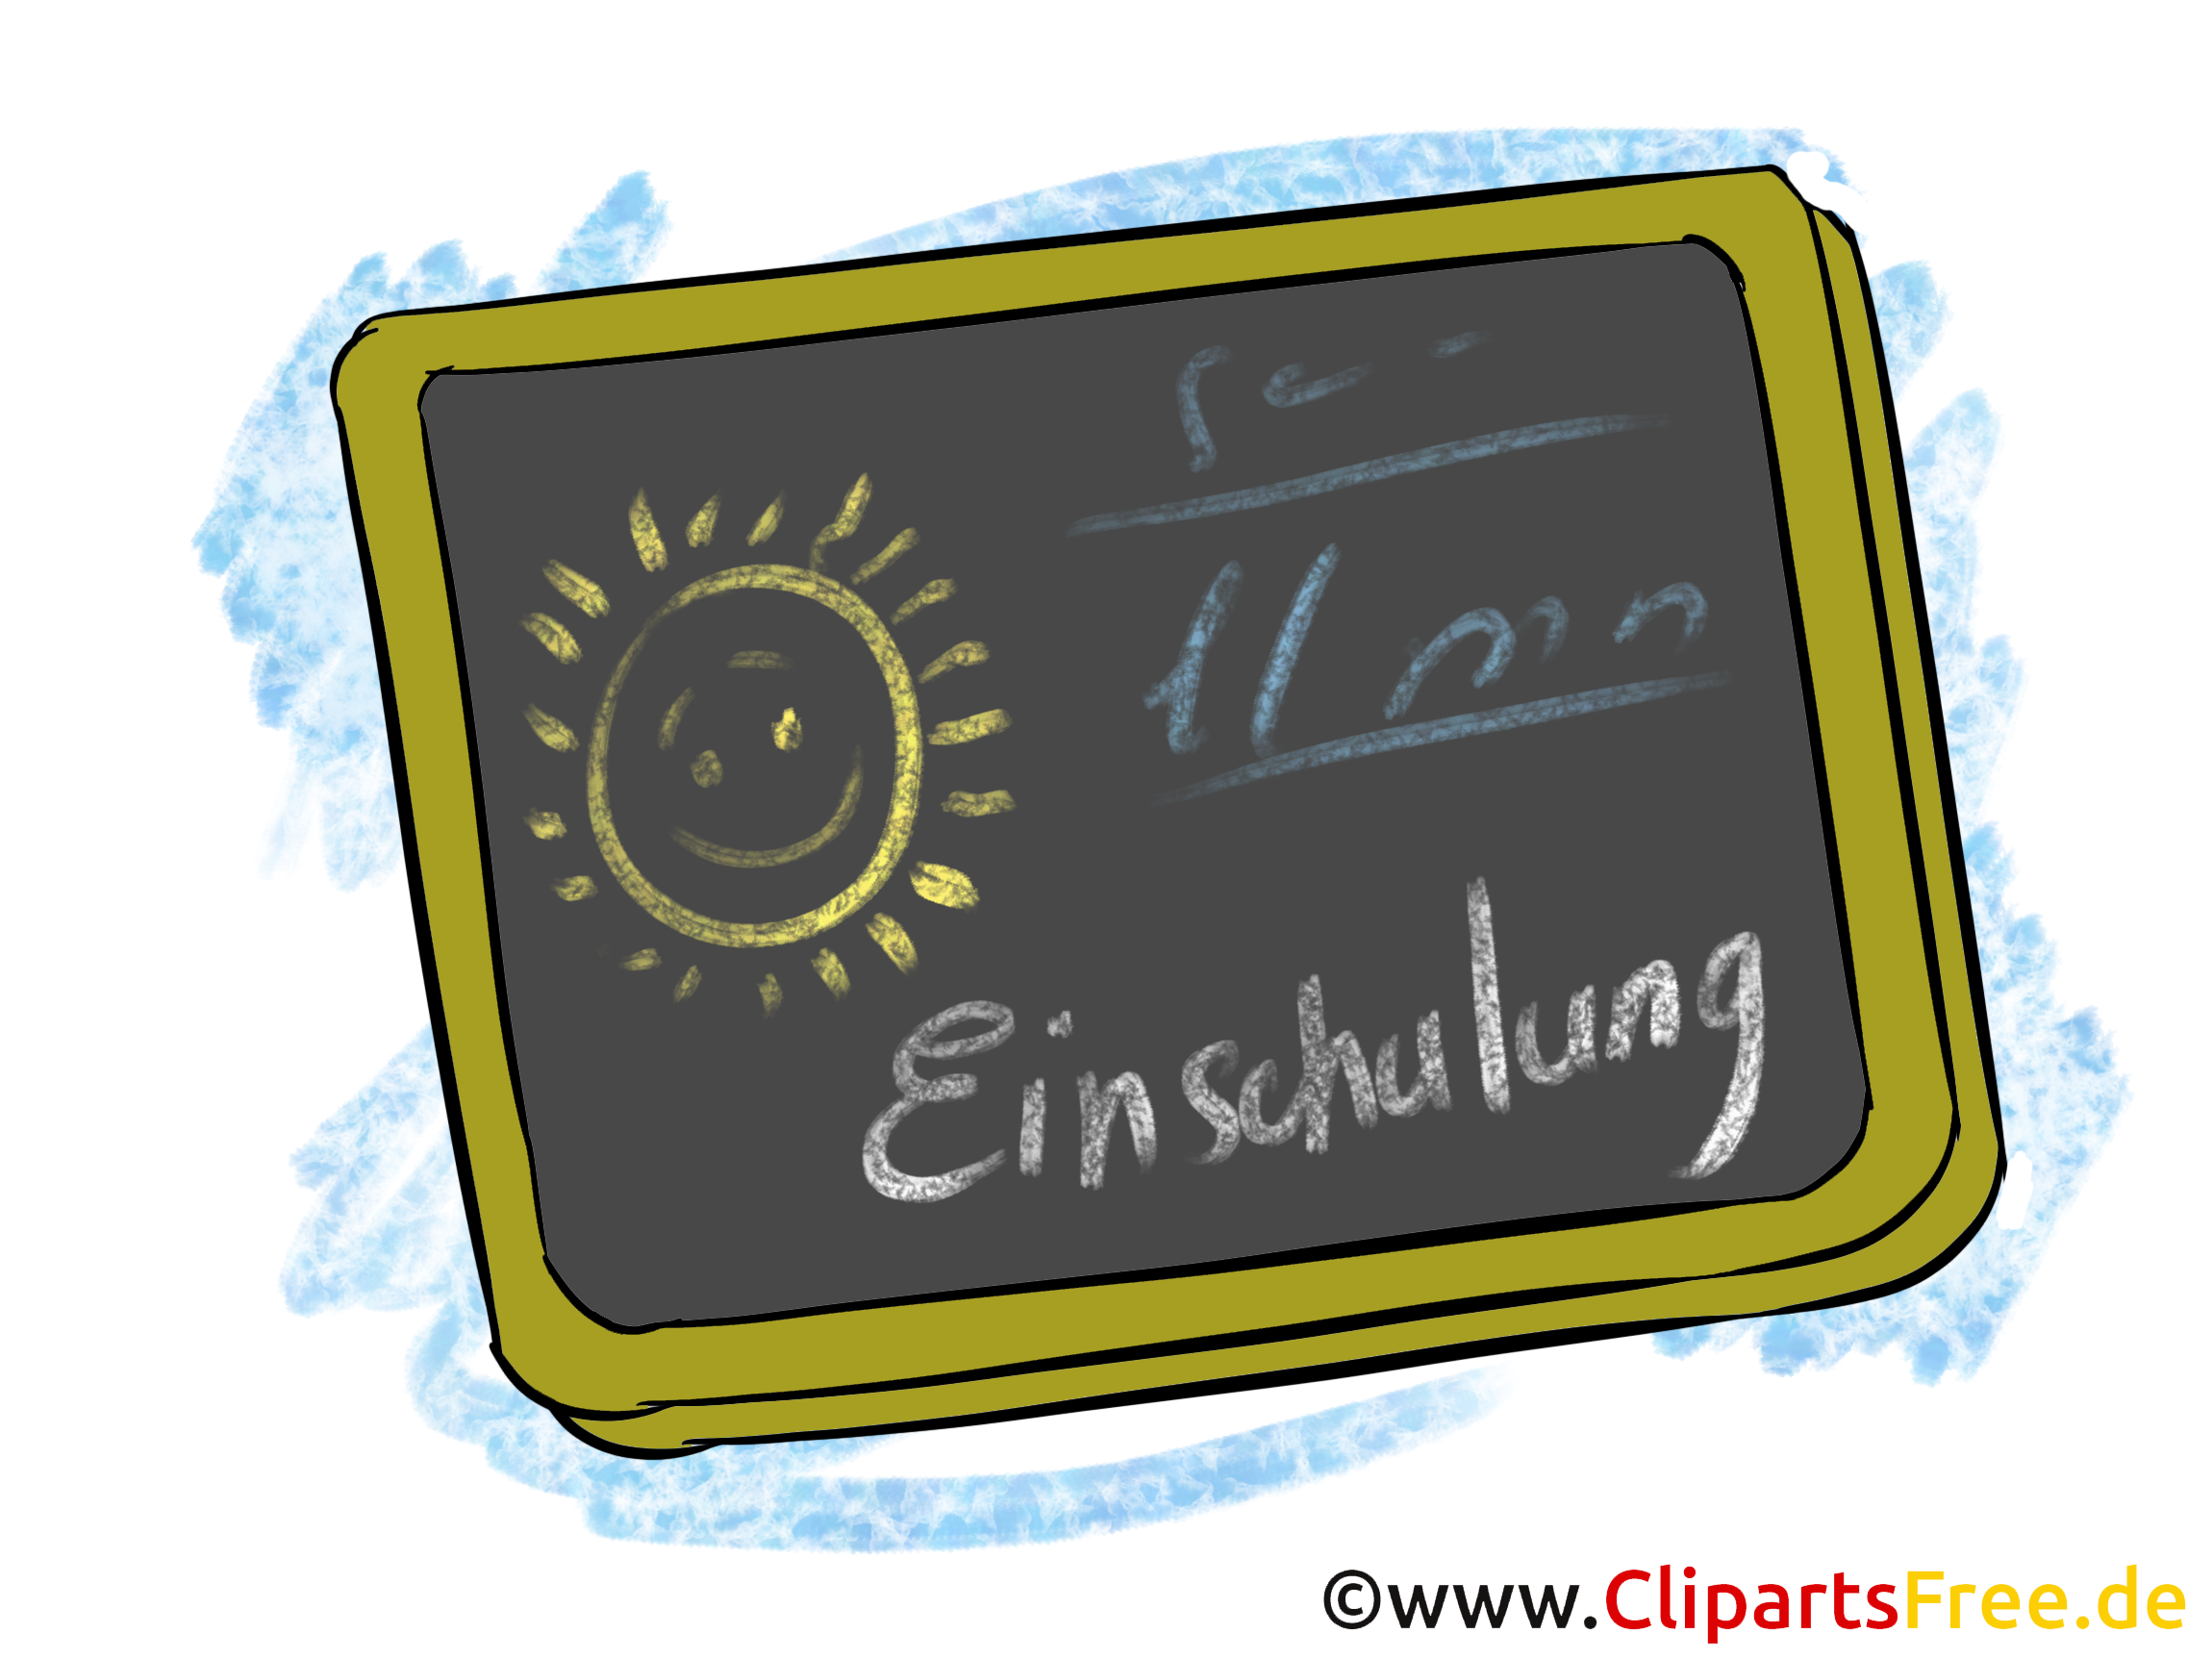 Schulanfang clipart kostenlos image transparent Schultafel Bild, Clipart, Grafik zum Schulanfang image transparent